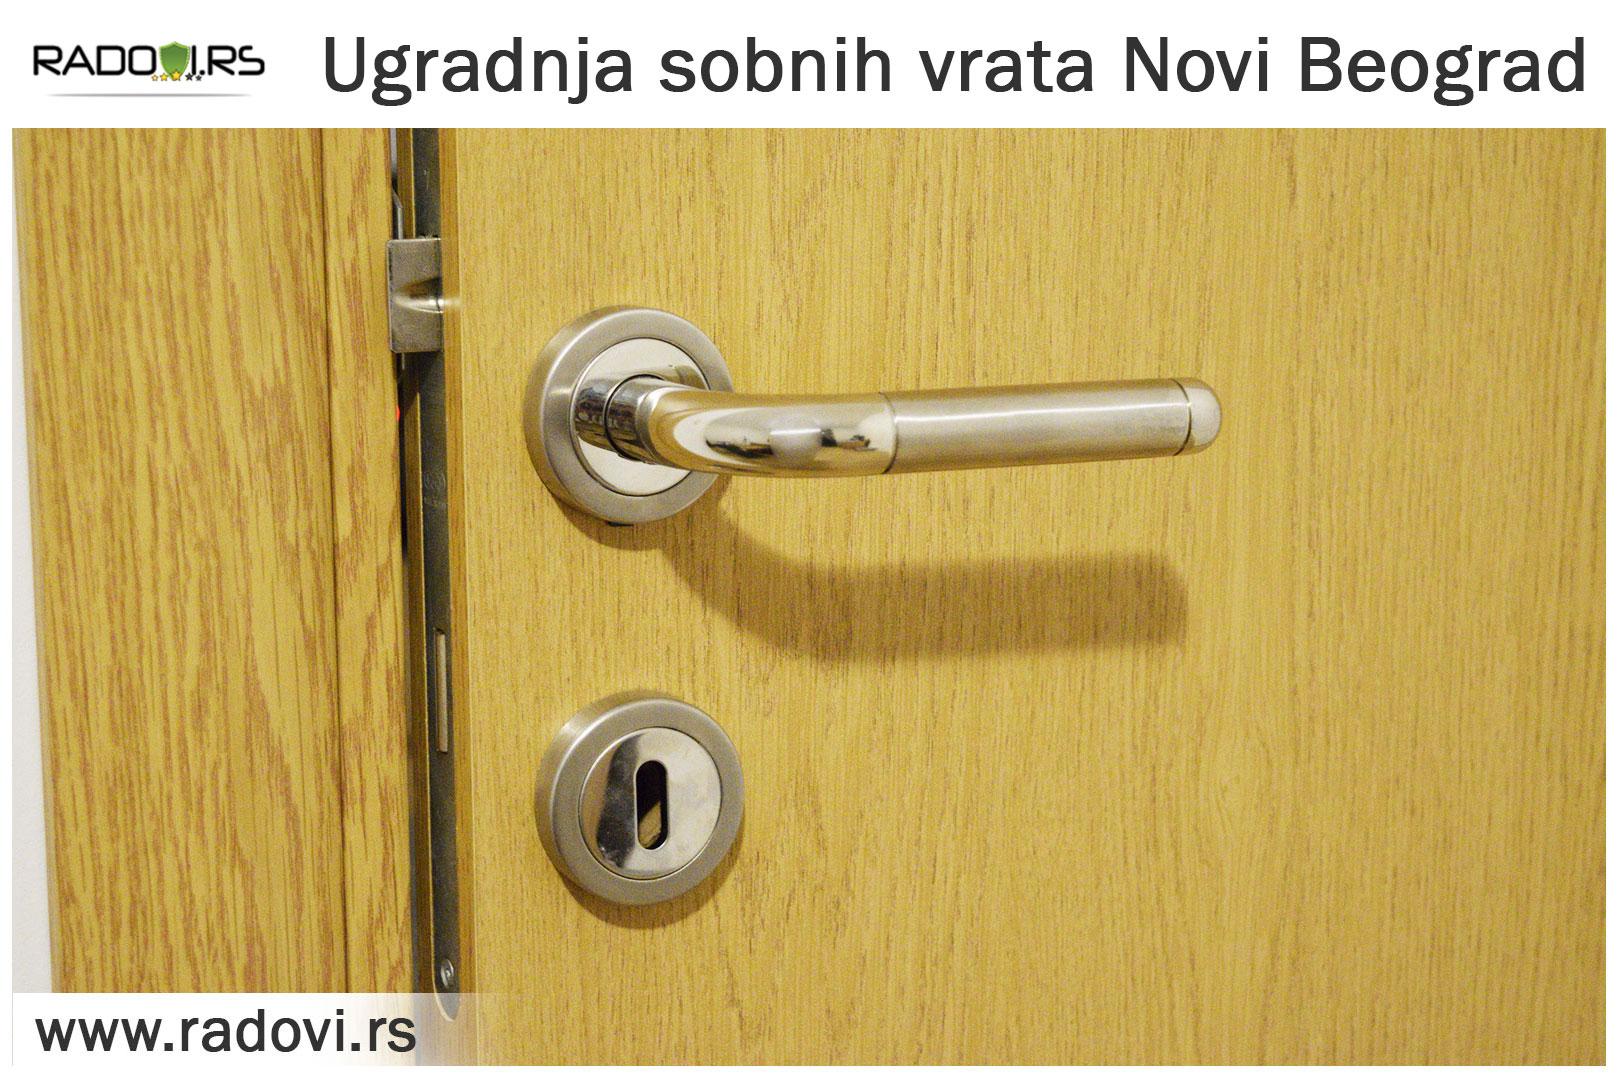 Ugradnja sobnih vrataNovi Beograd - PVC stolarija Tim - Radovi.rs